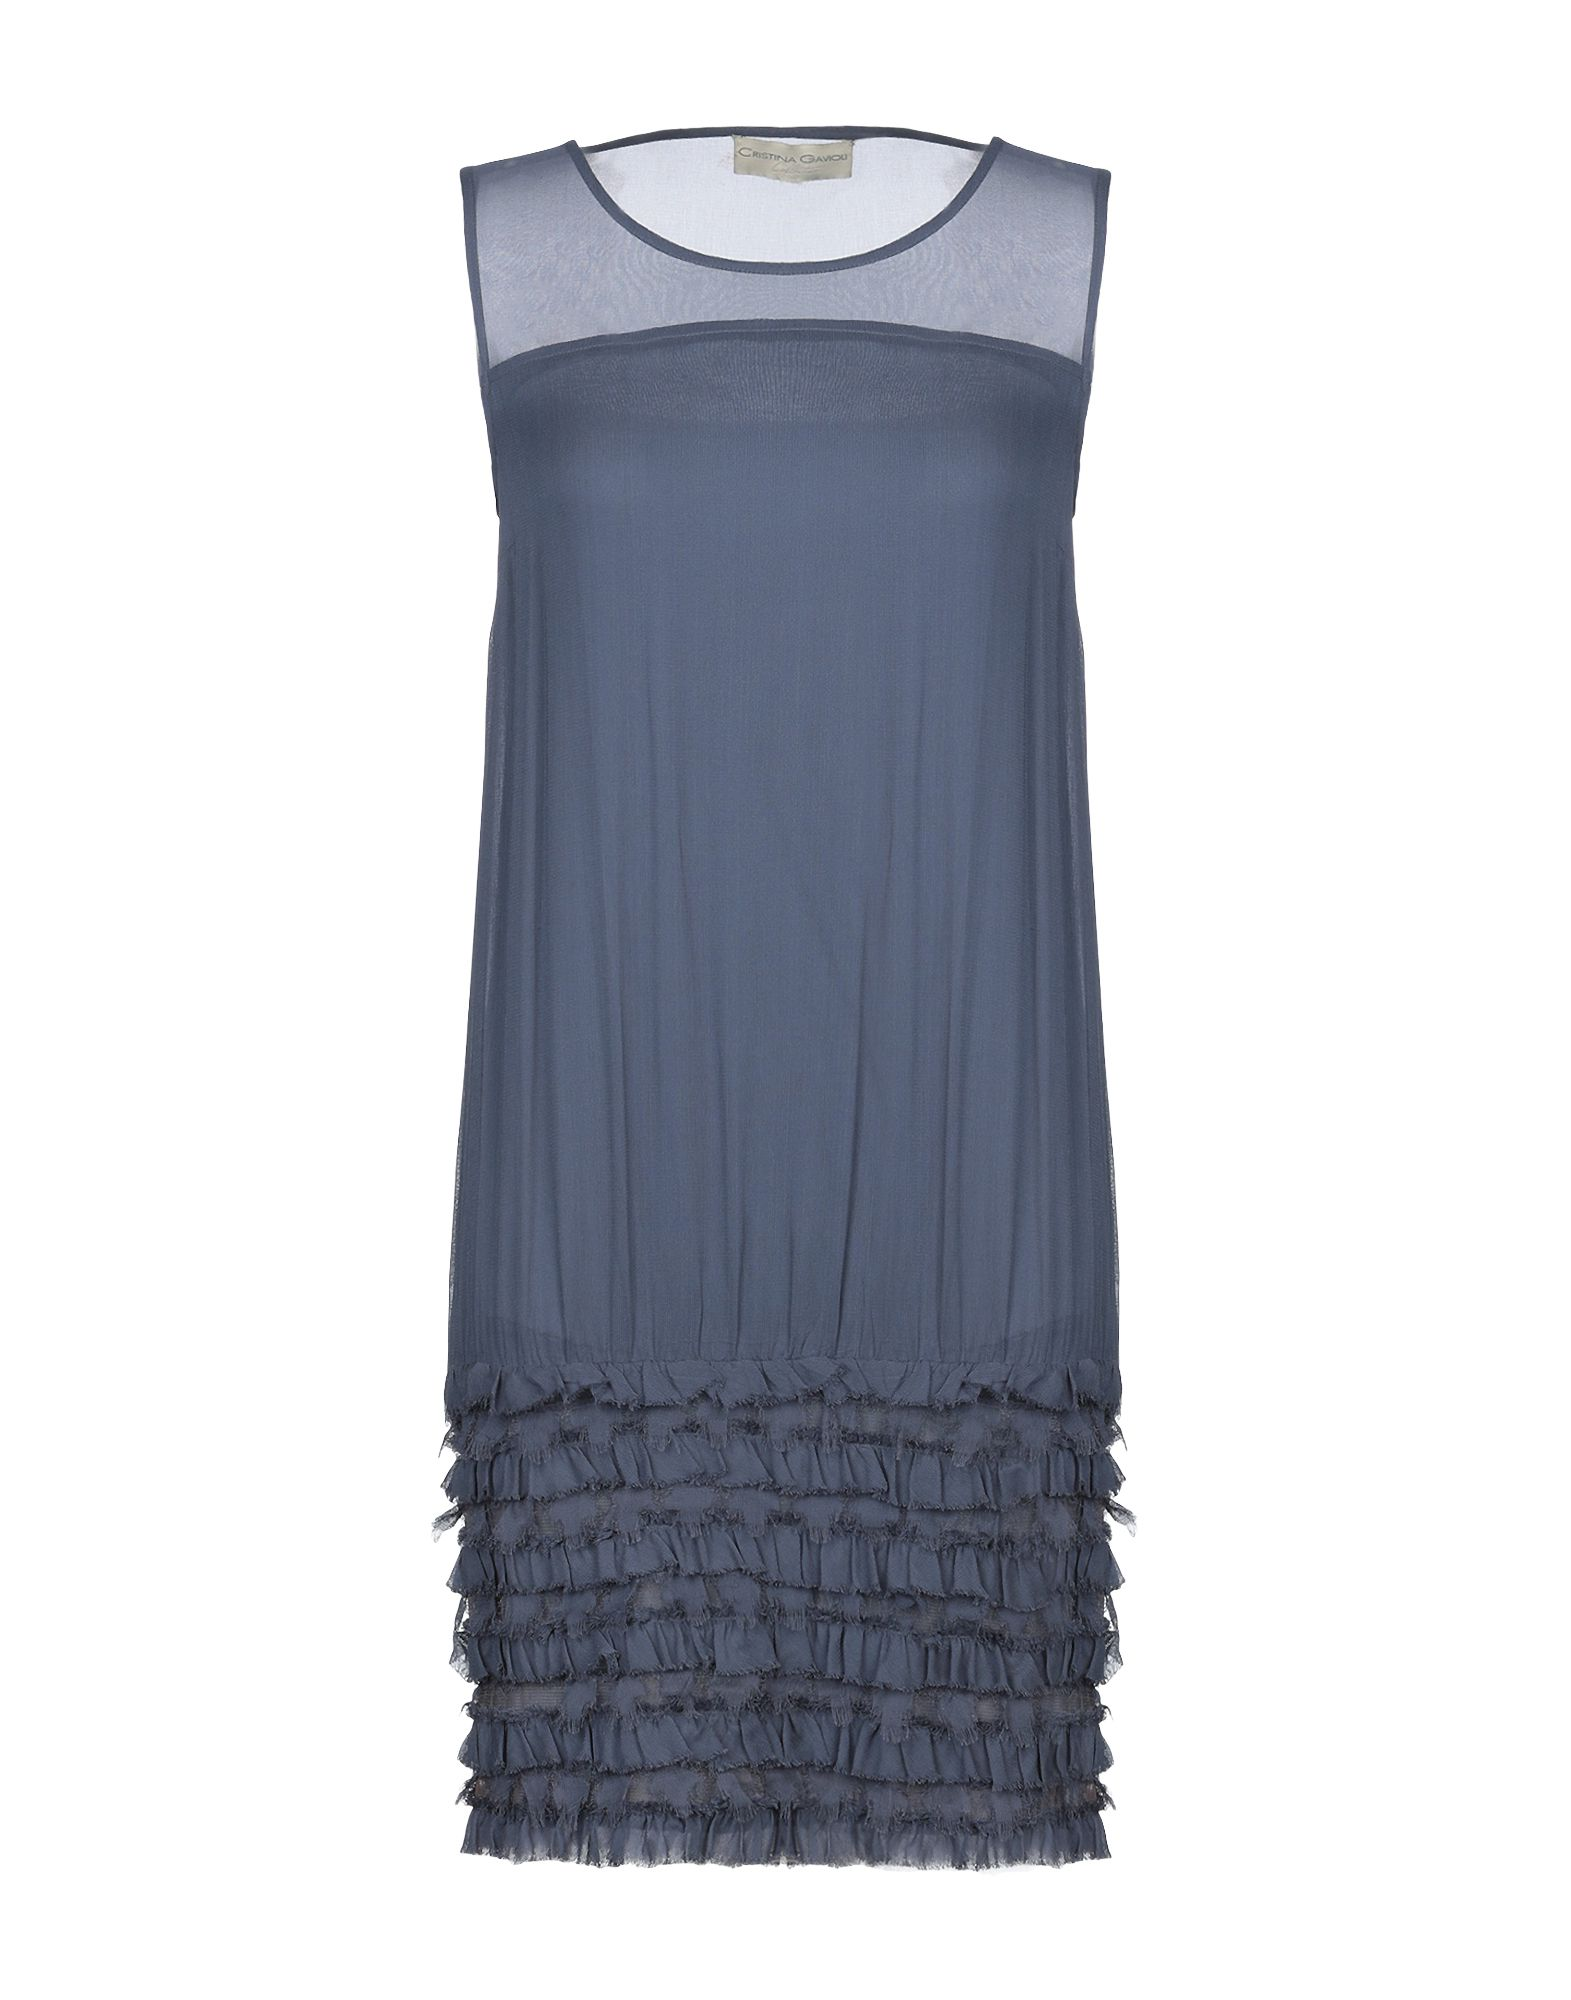 CRISTINA GAVIOLI COLLECTION Короткое платье cristina gavioli collection длинная юбка